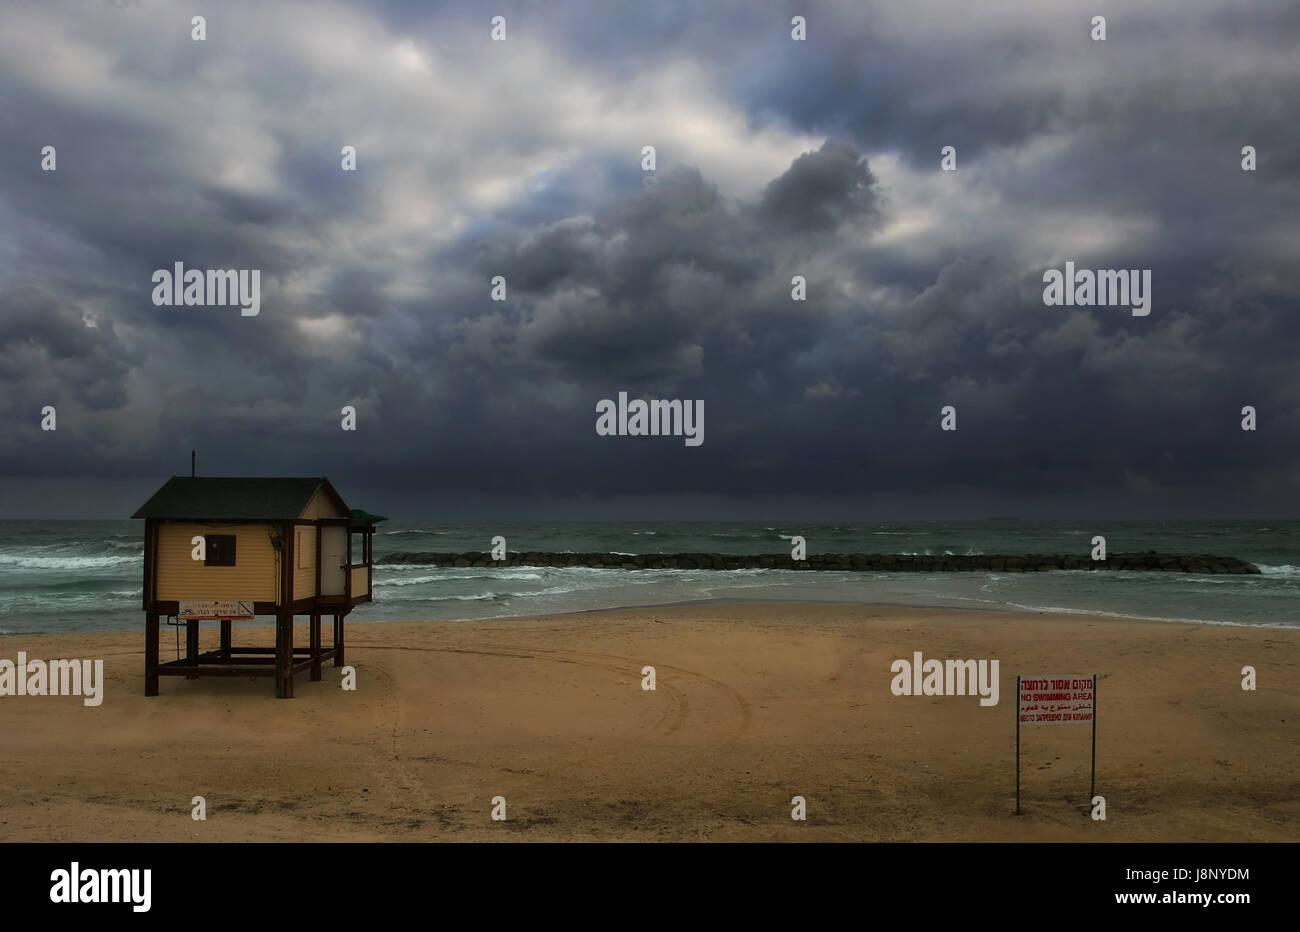 beach, seaside, the beach, seashore, israel, weather, landscape, scenery, - Stock Image